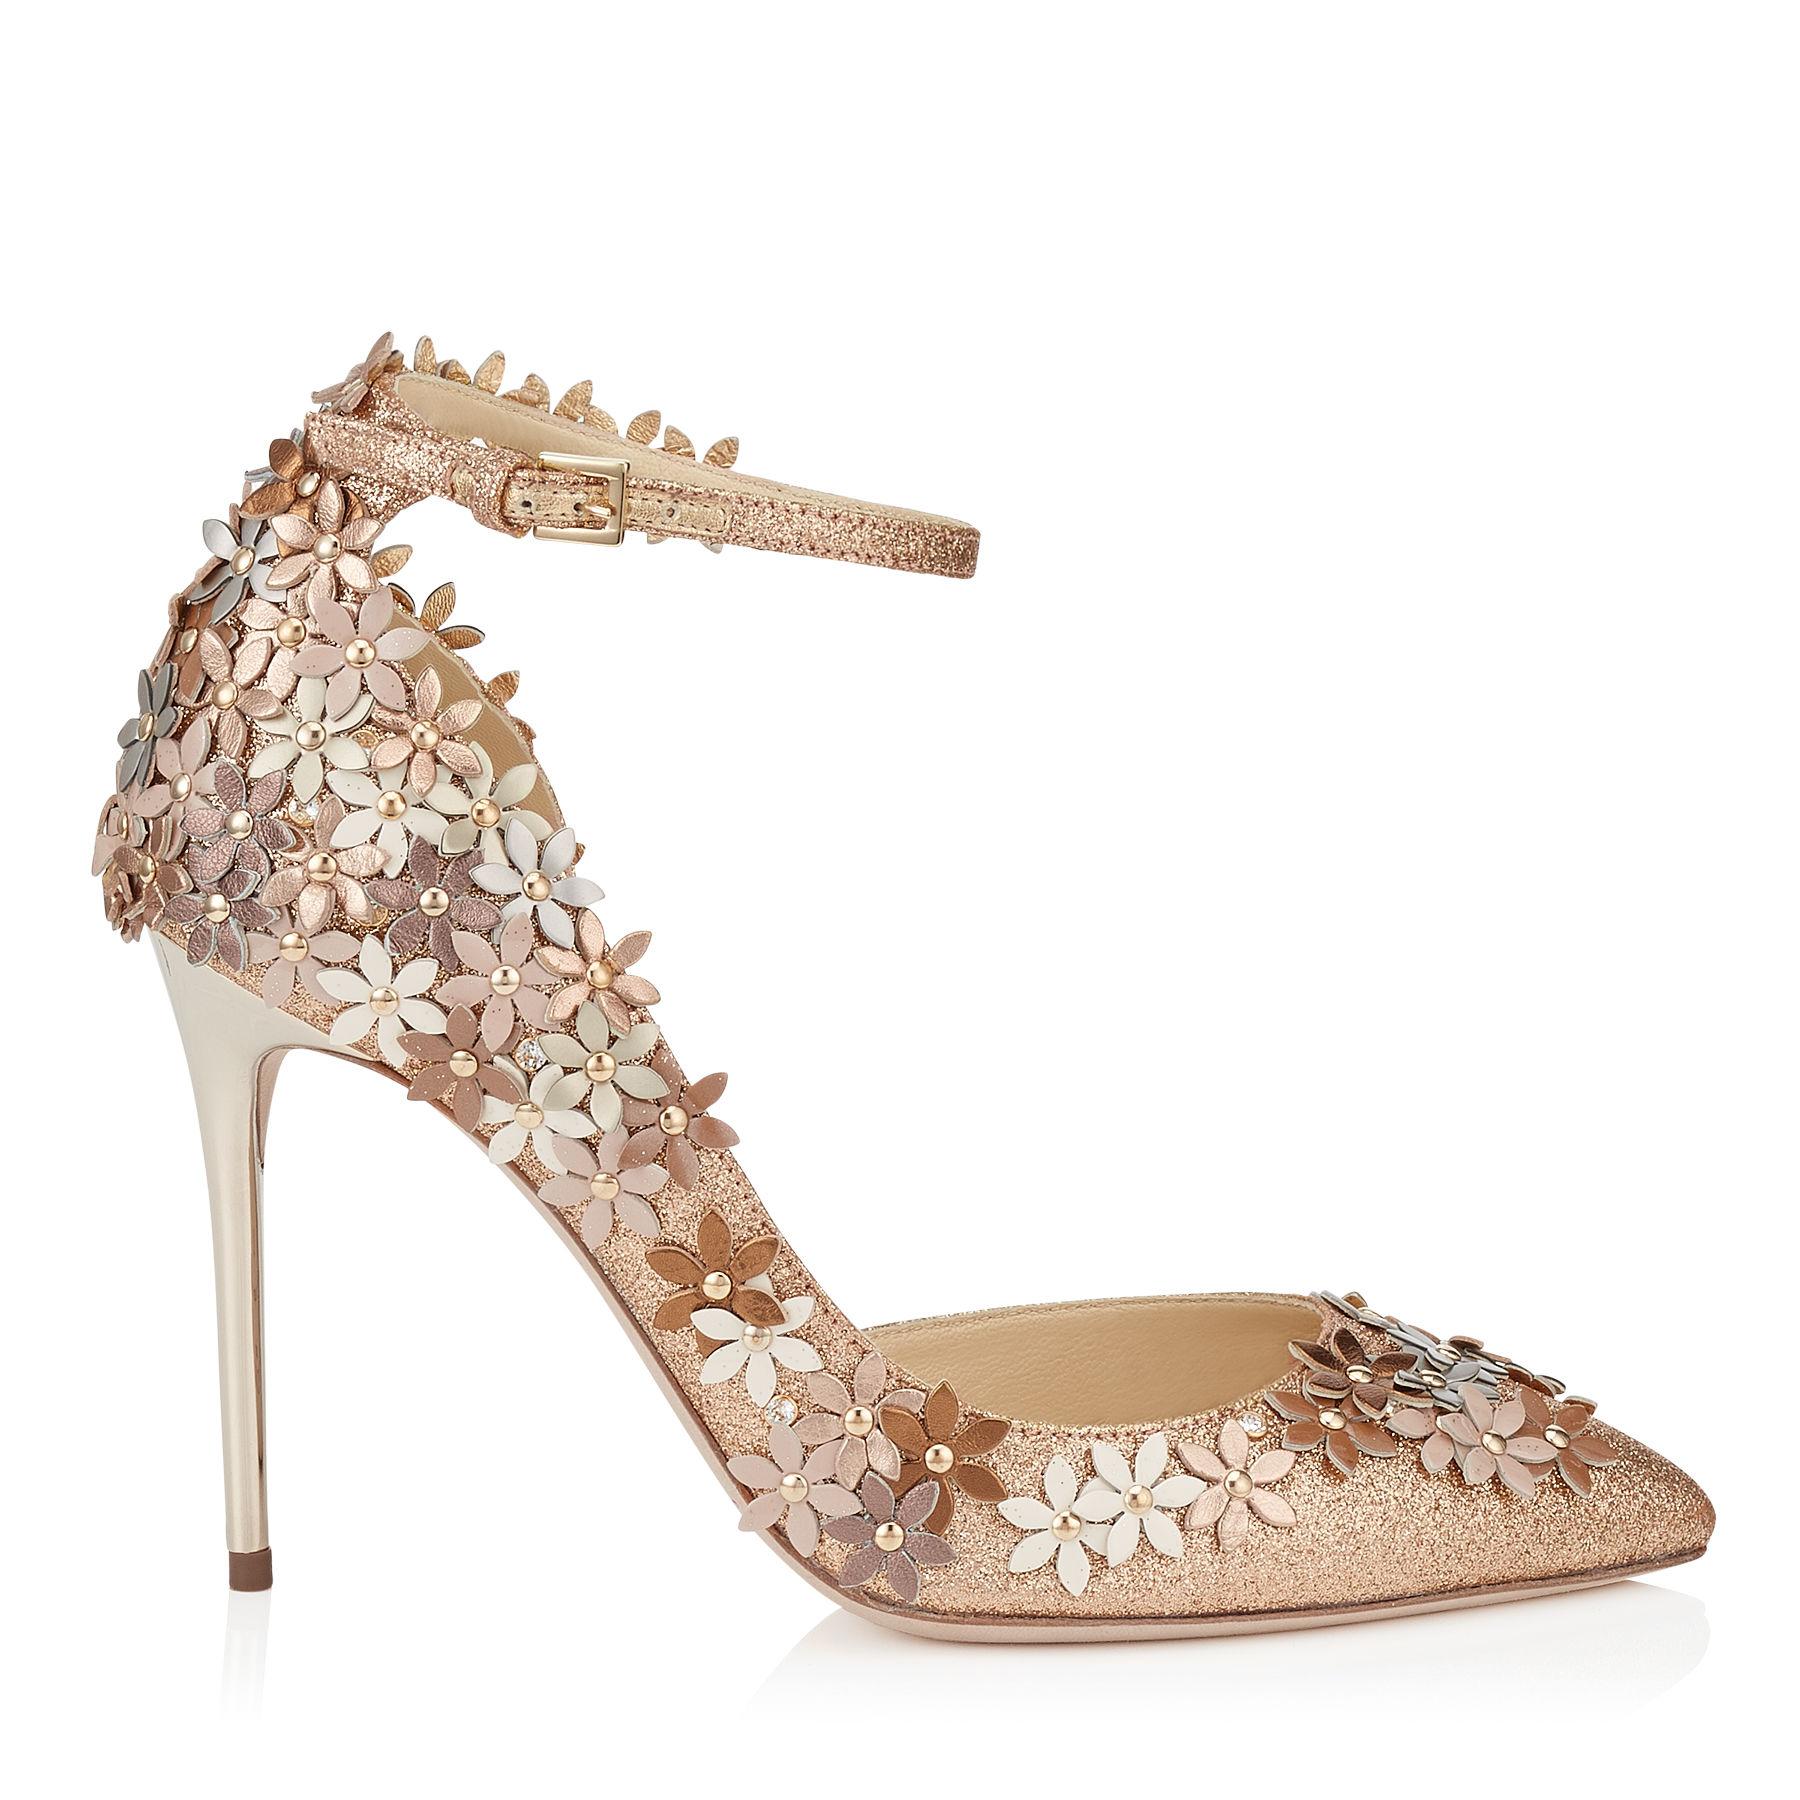 ... scarpe jimmy choo 2016 - Shoeplay Fashion blog di scarpe da donna  a641a11518803cc  Collezione ... 696f2fc68ea